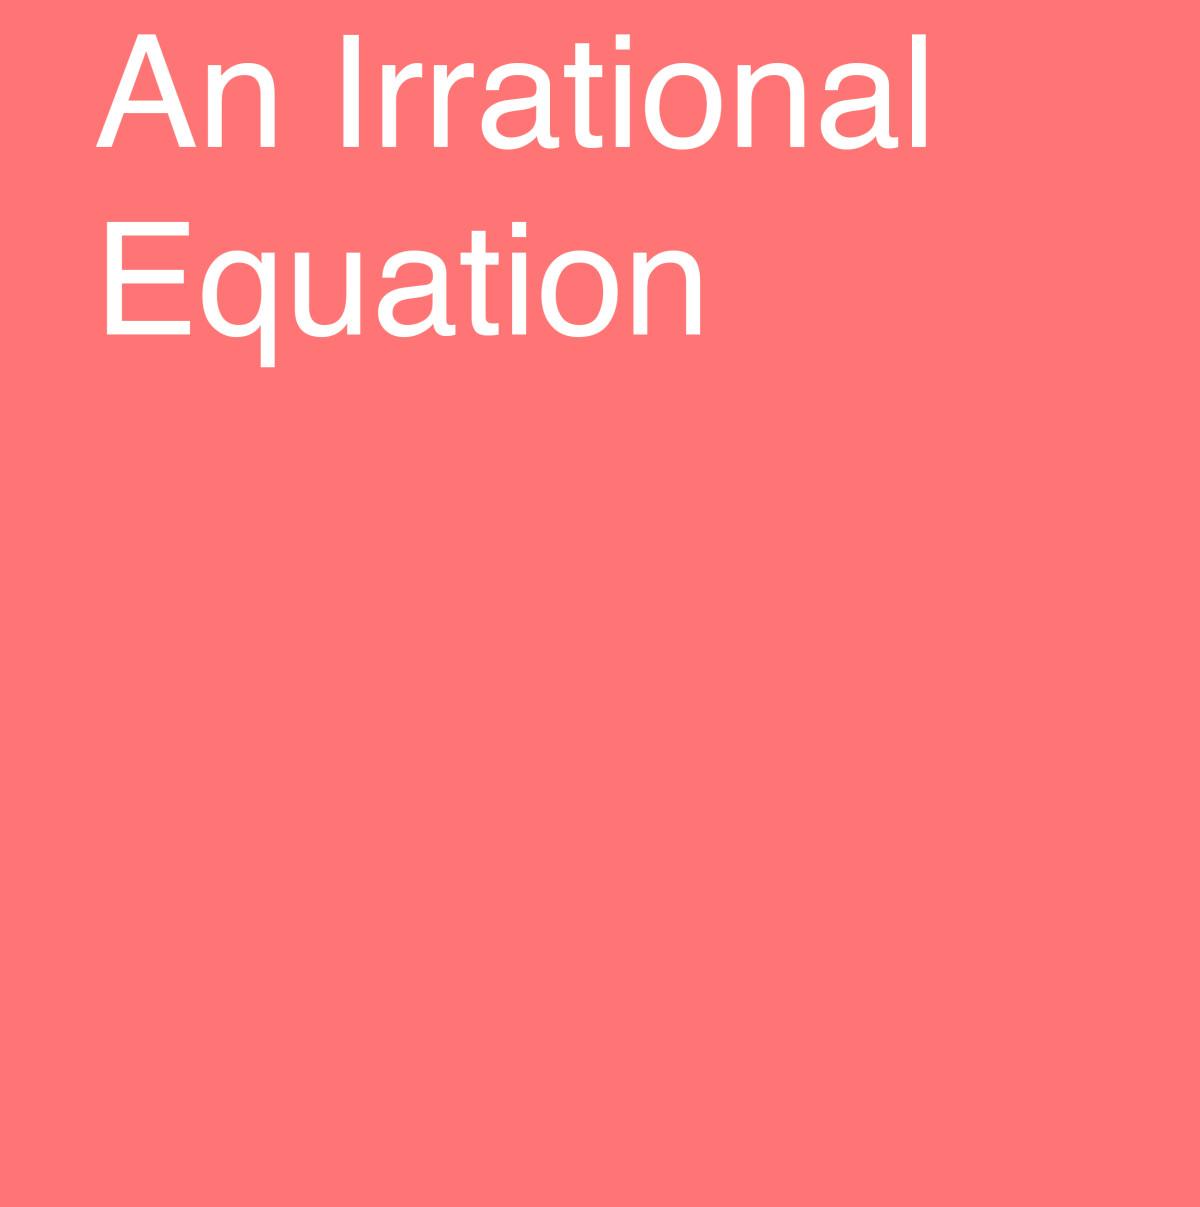 An Irrational Equation